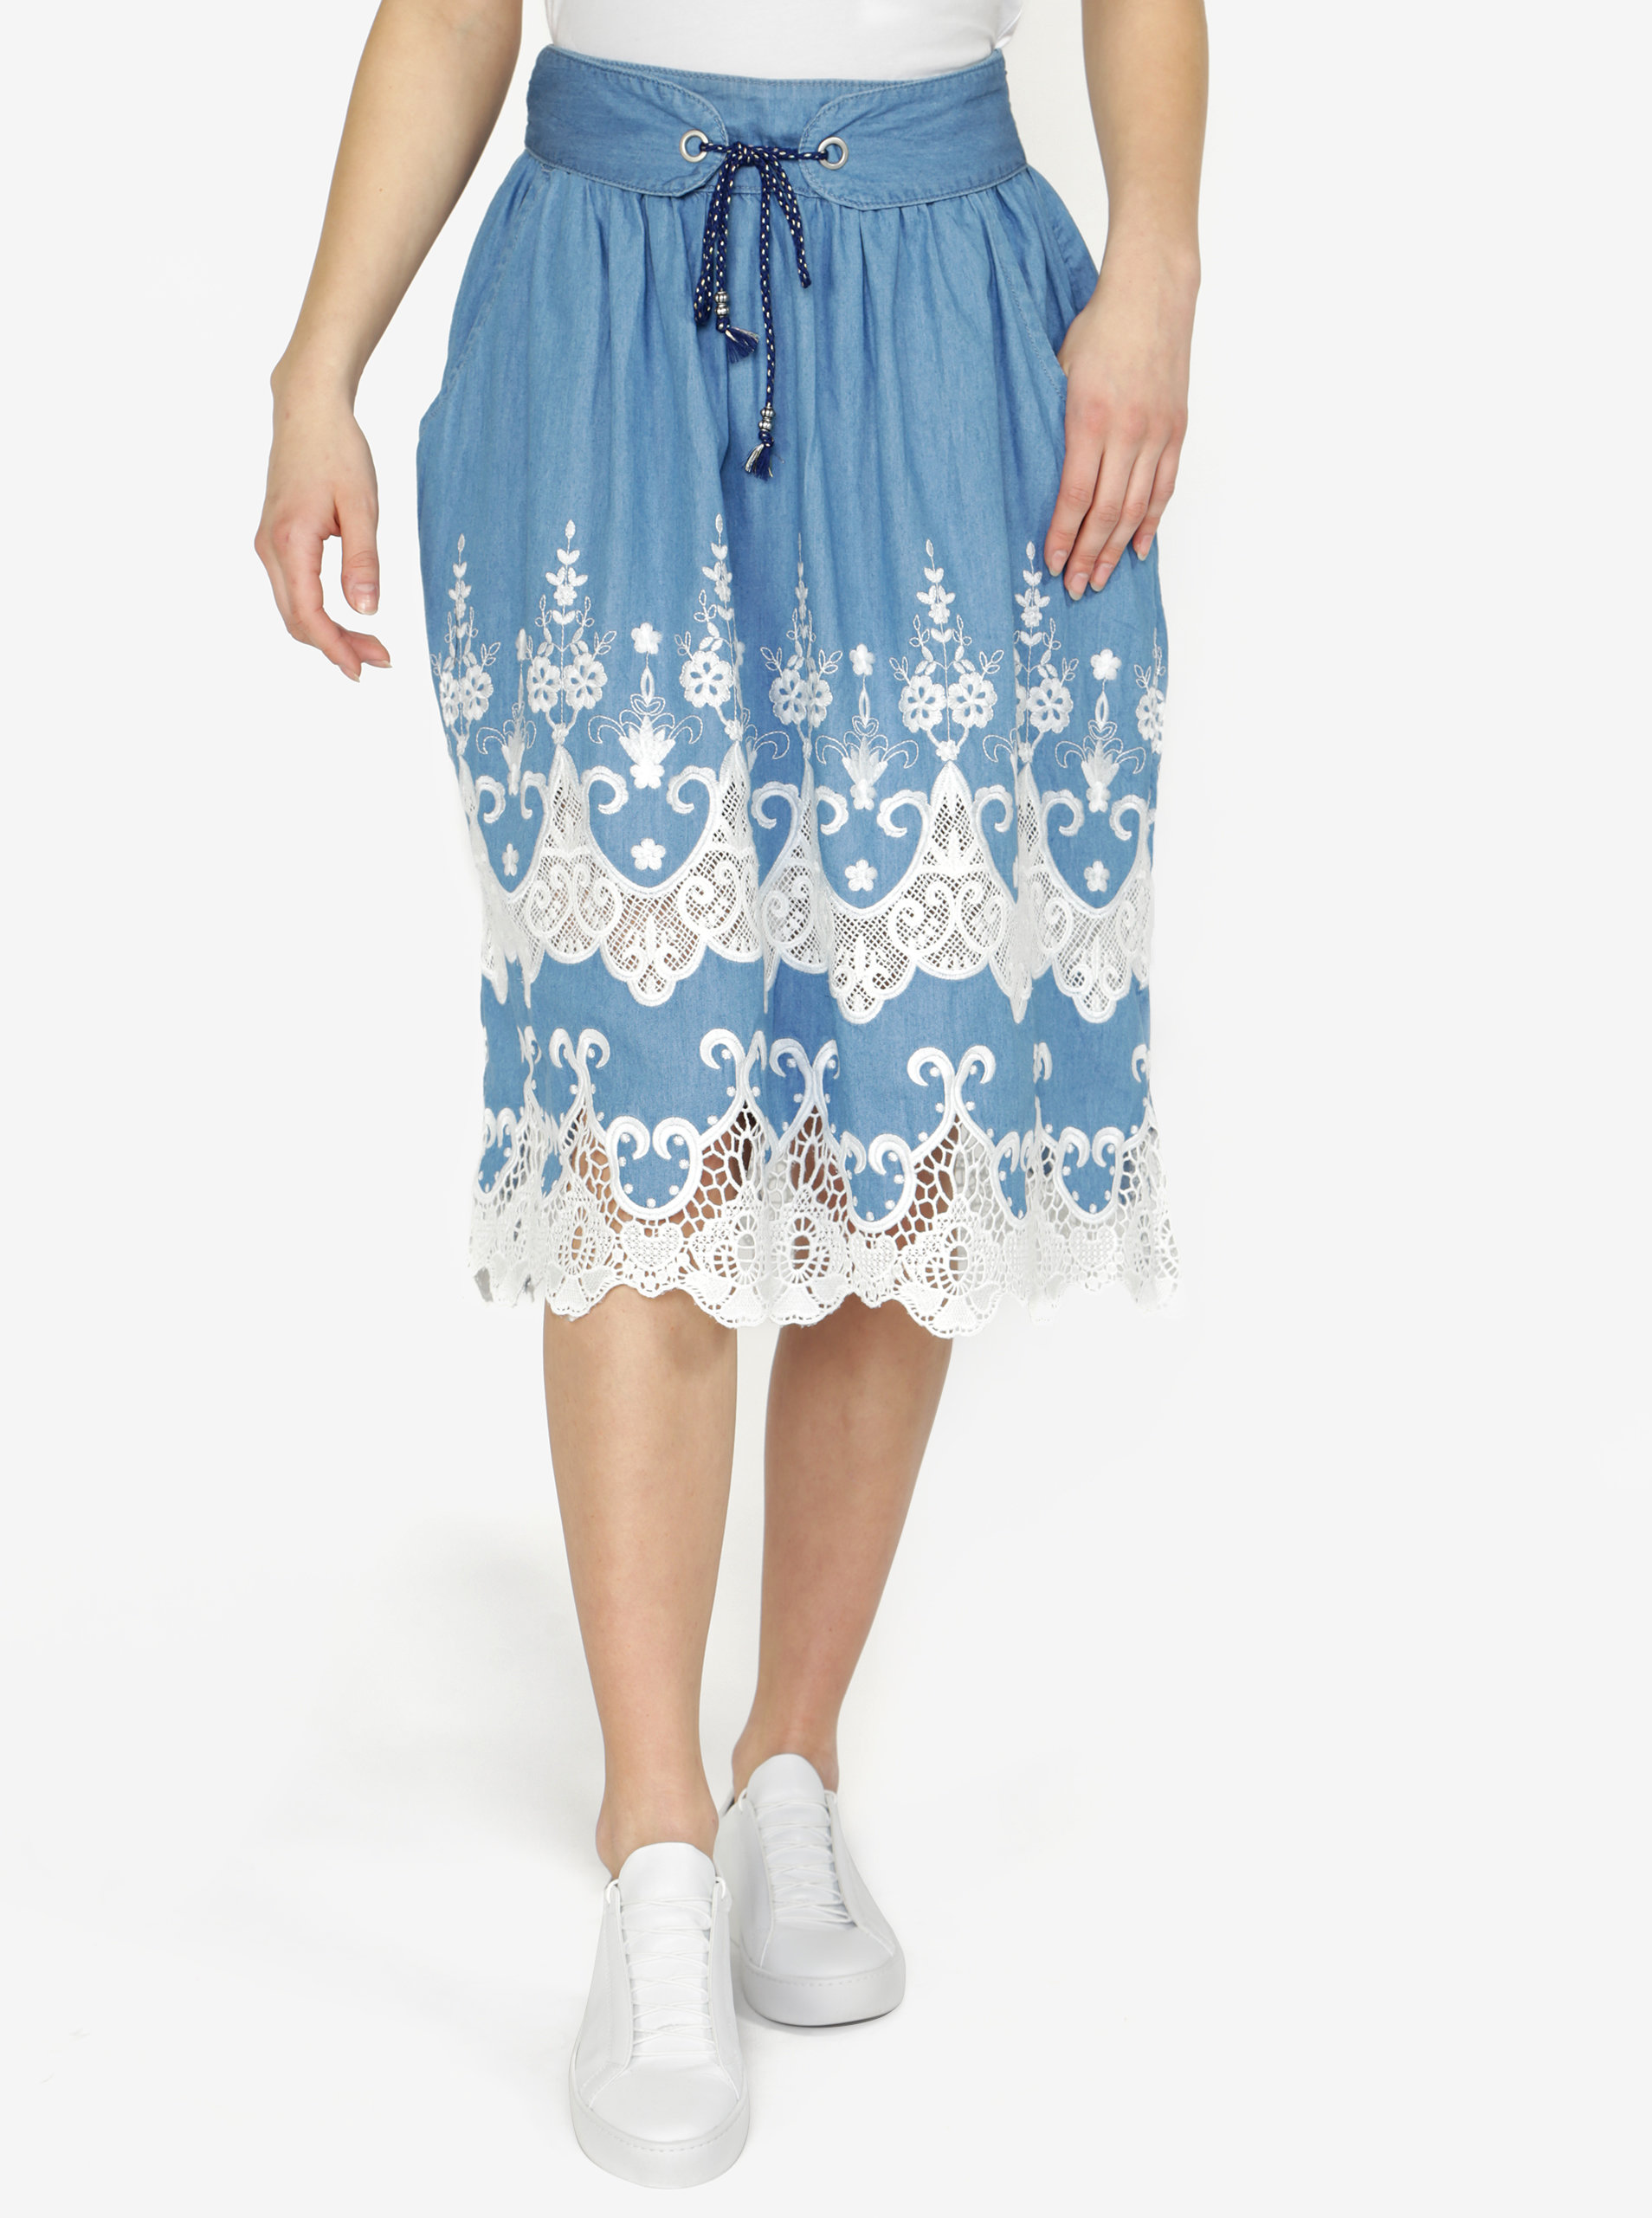 Modrá rifľová sukňa Desigual Blues Explosion ... 6e2e1ada55d